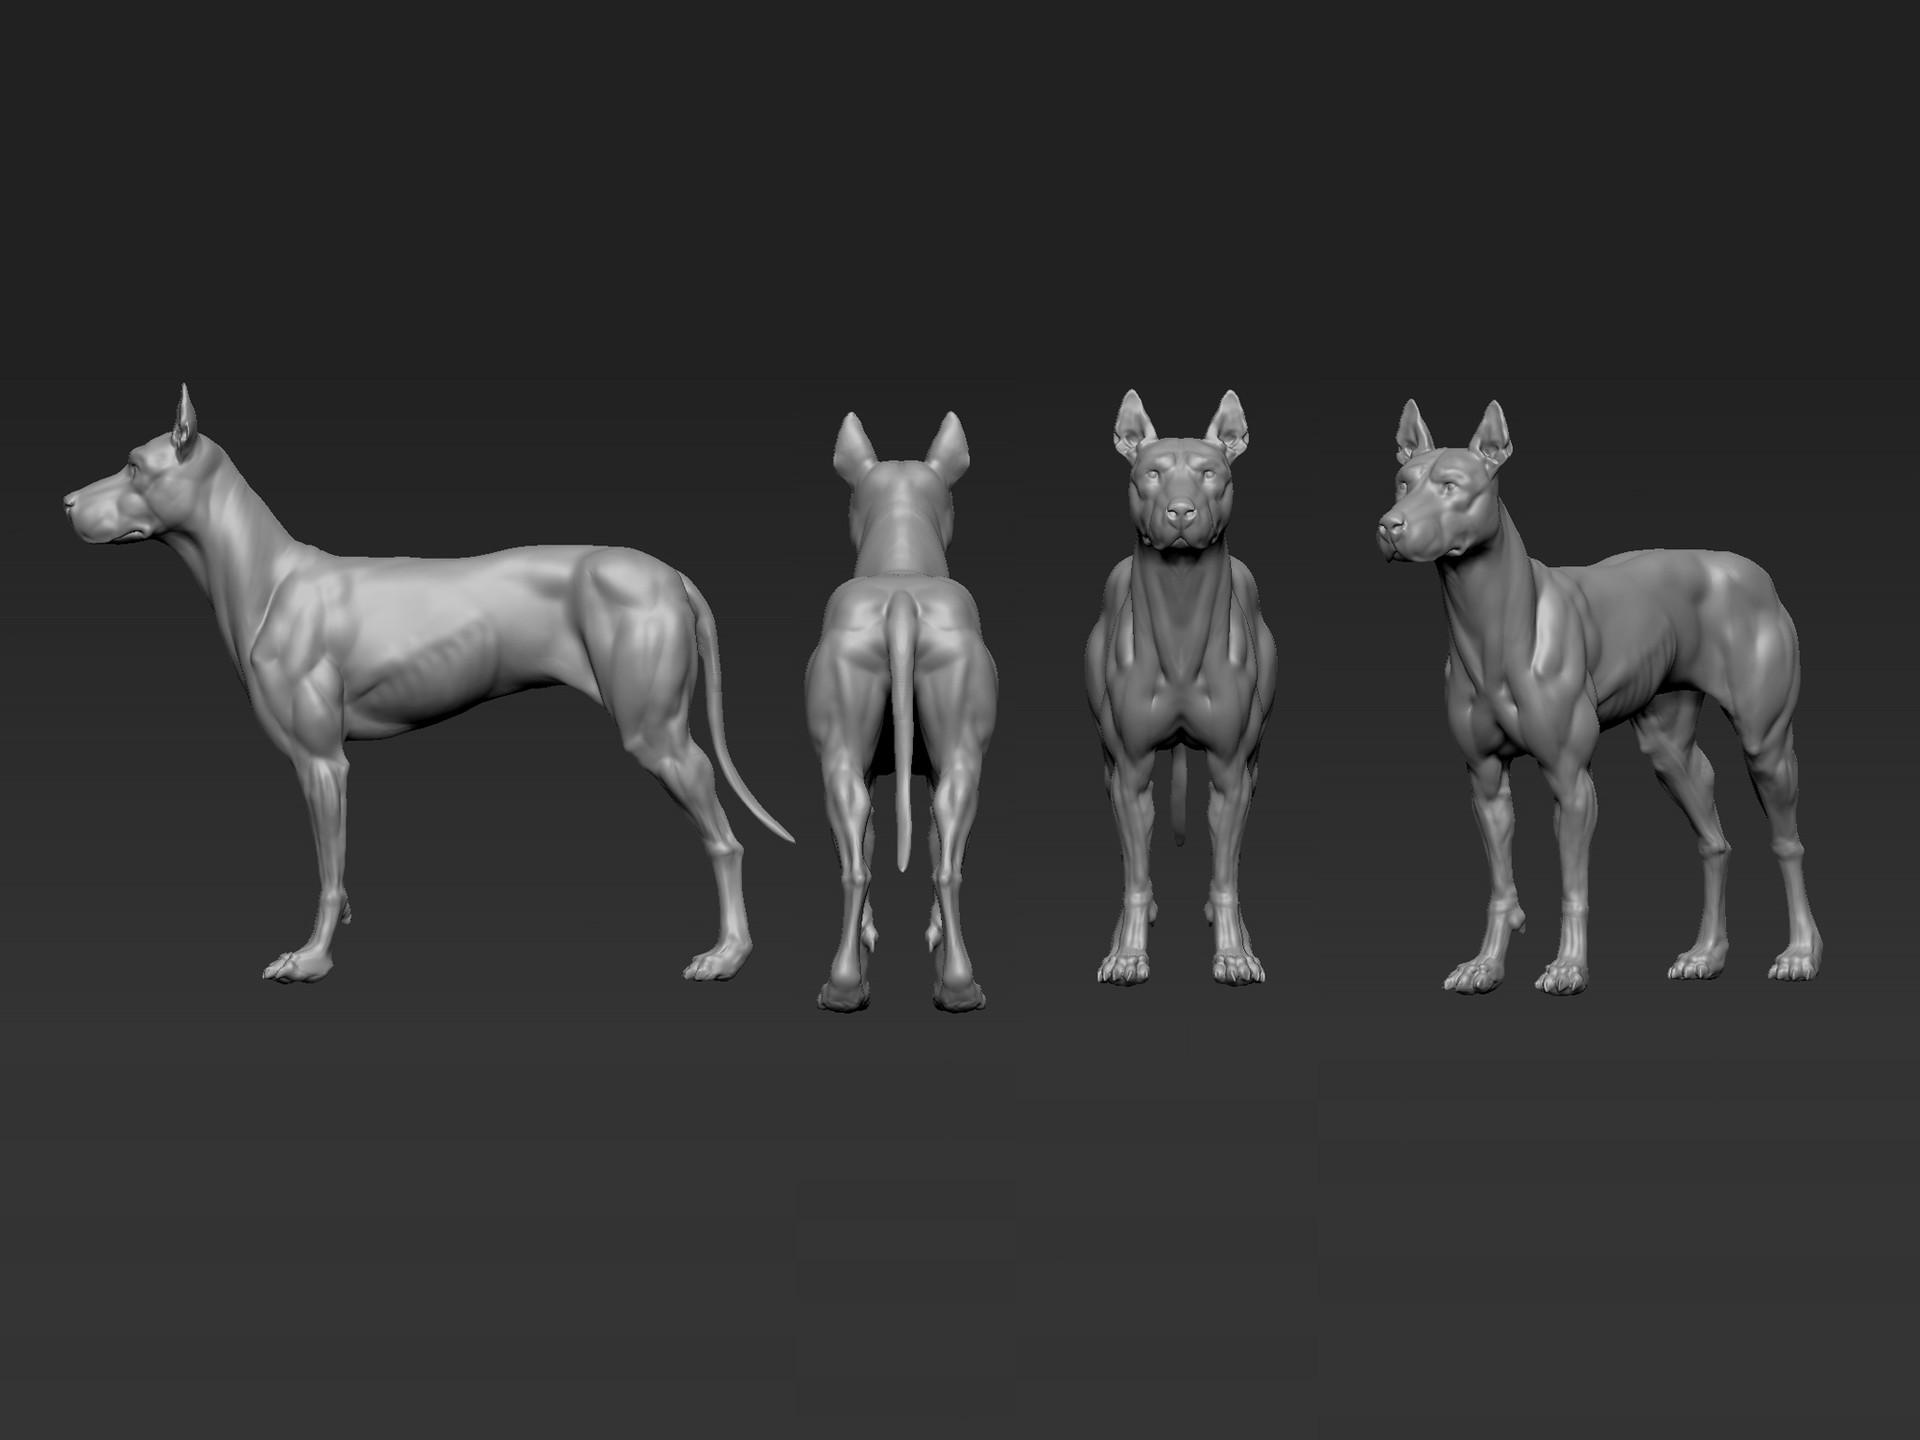 ArtStation - Dog Anatomy Study, Genesis Asis